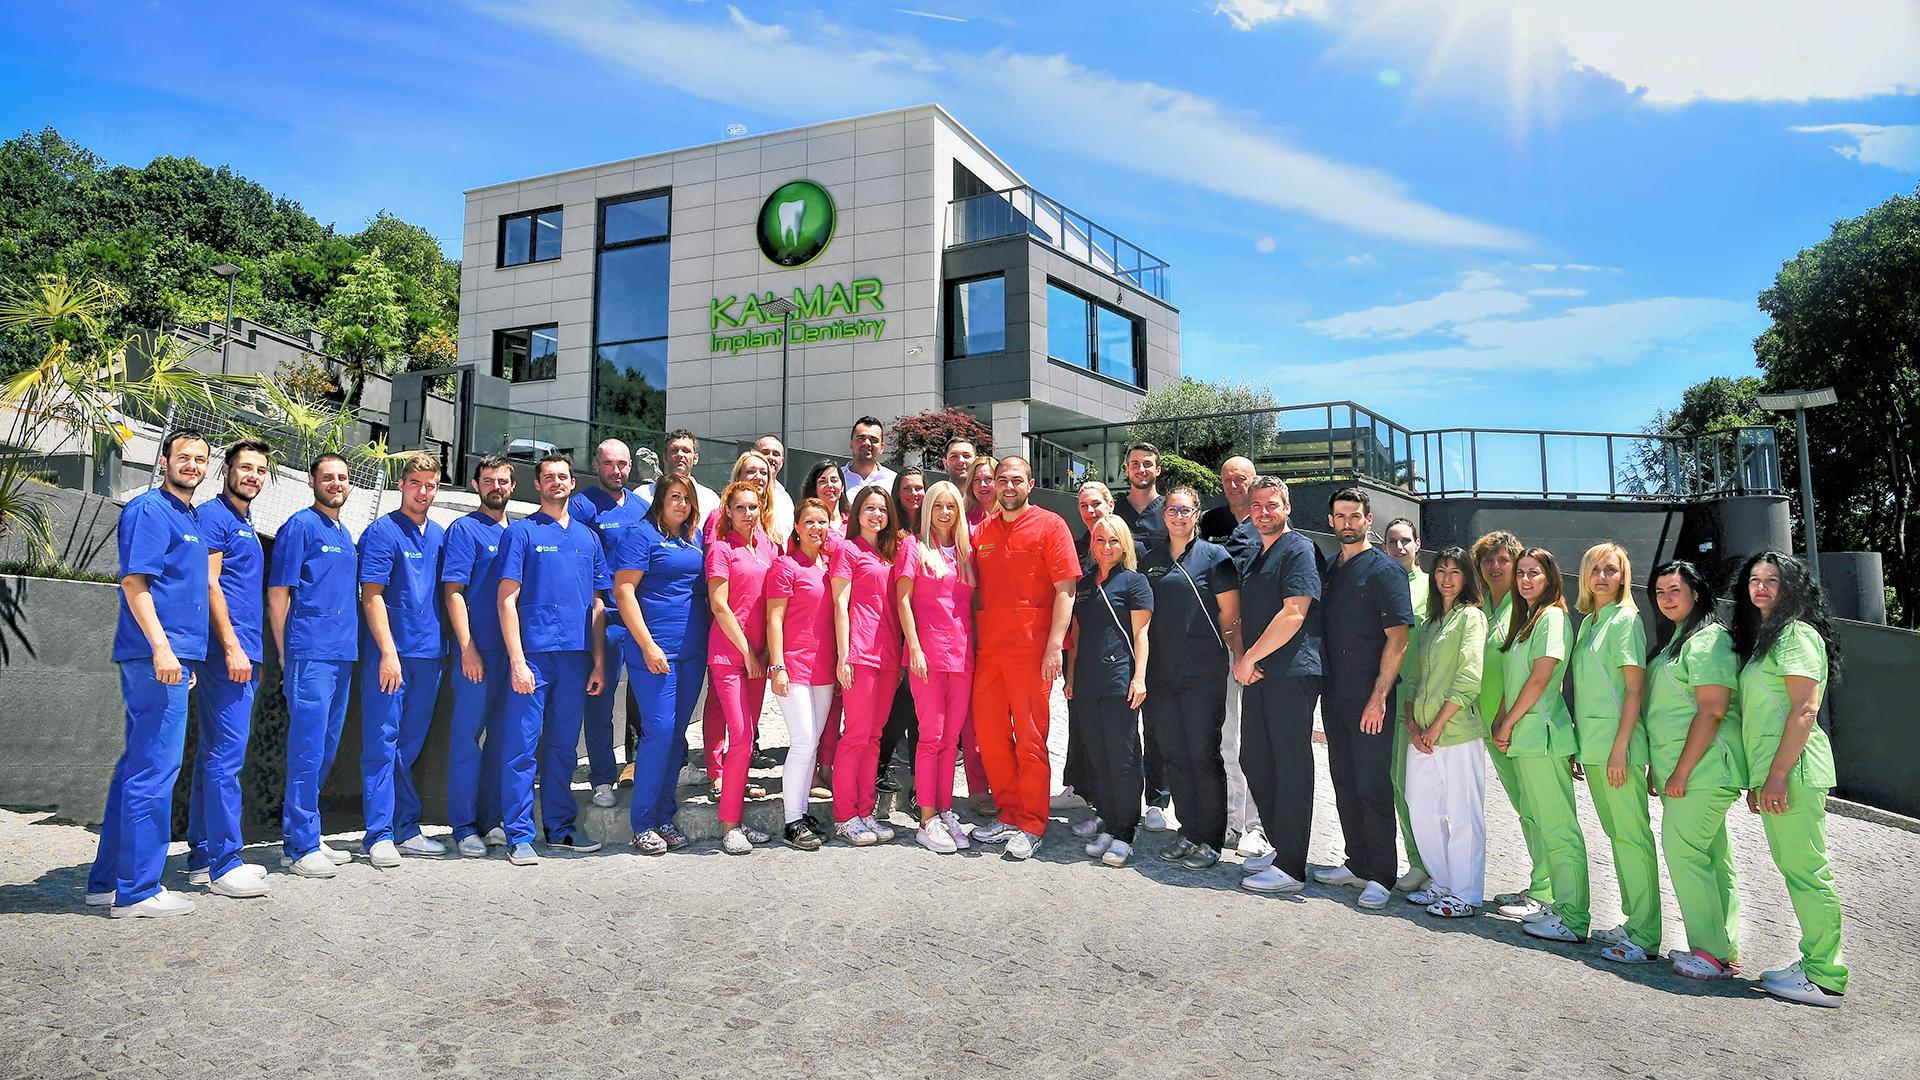 CROATIA: Kalmar Implant Dentistry – GCR™ Internationally Accredited